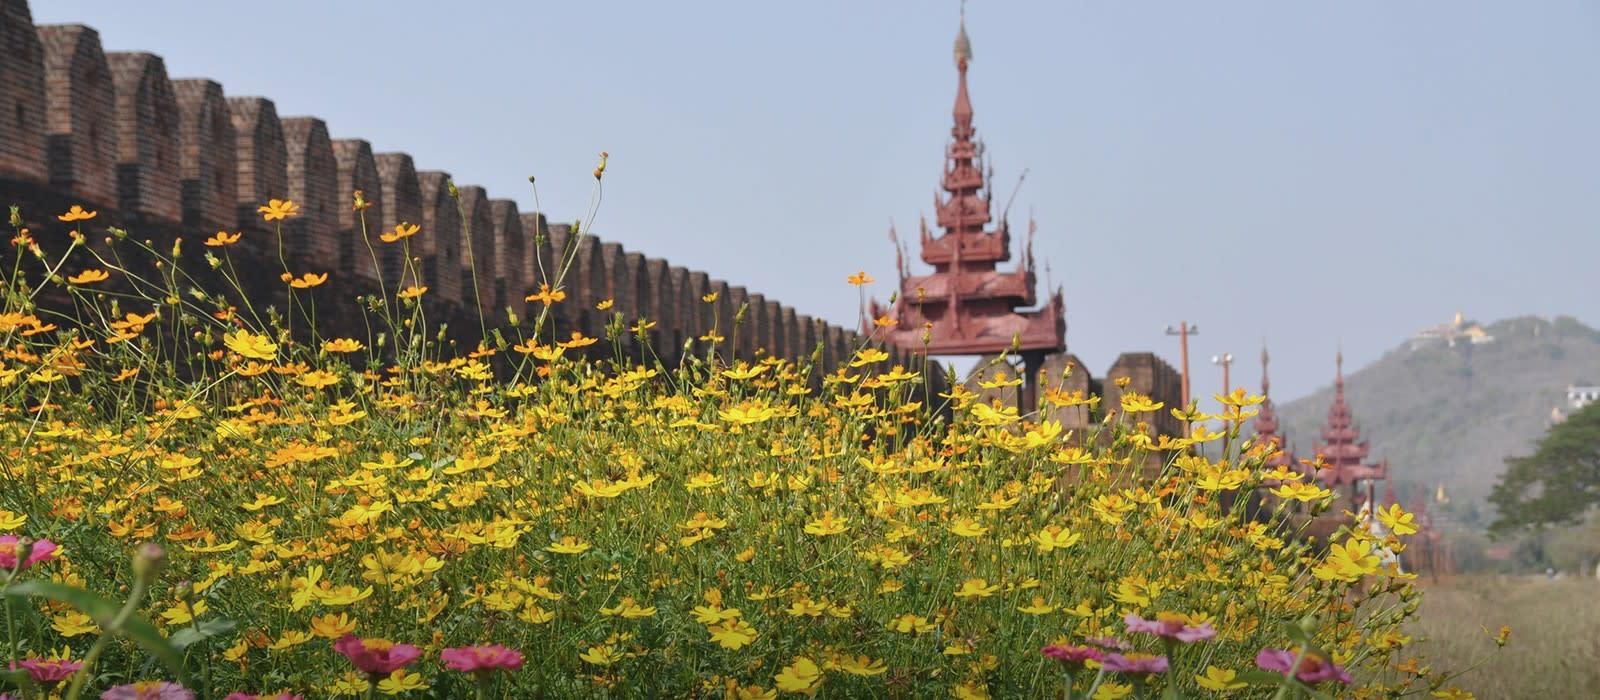 Reiseziel Mandalay Myanmar